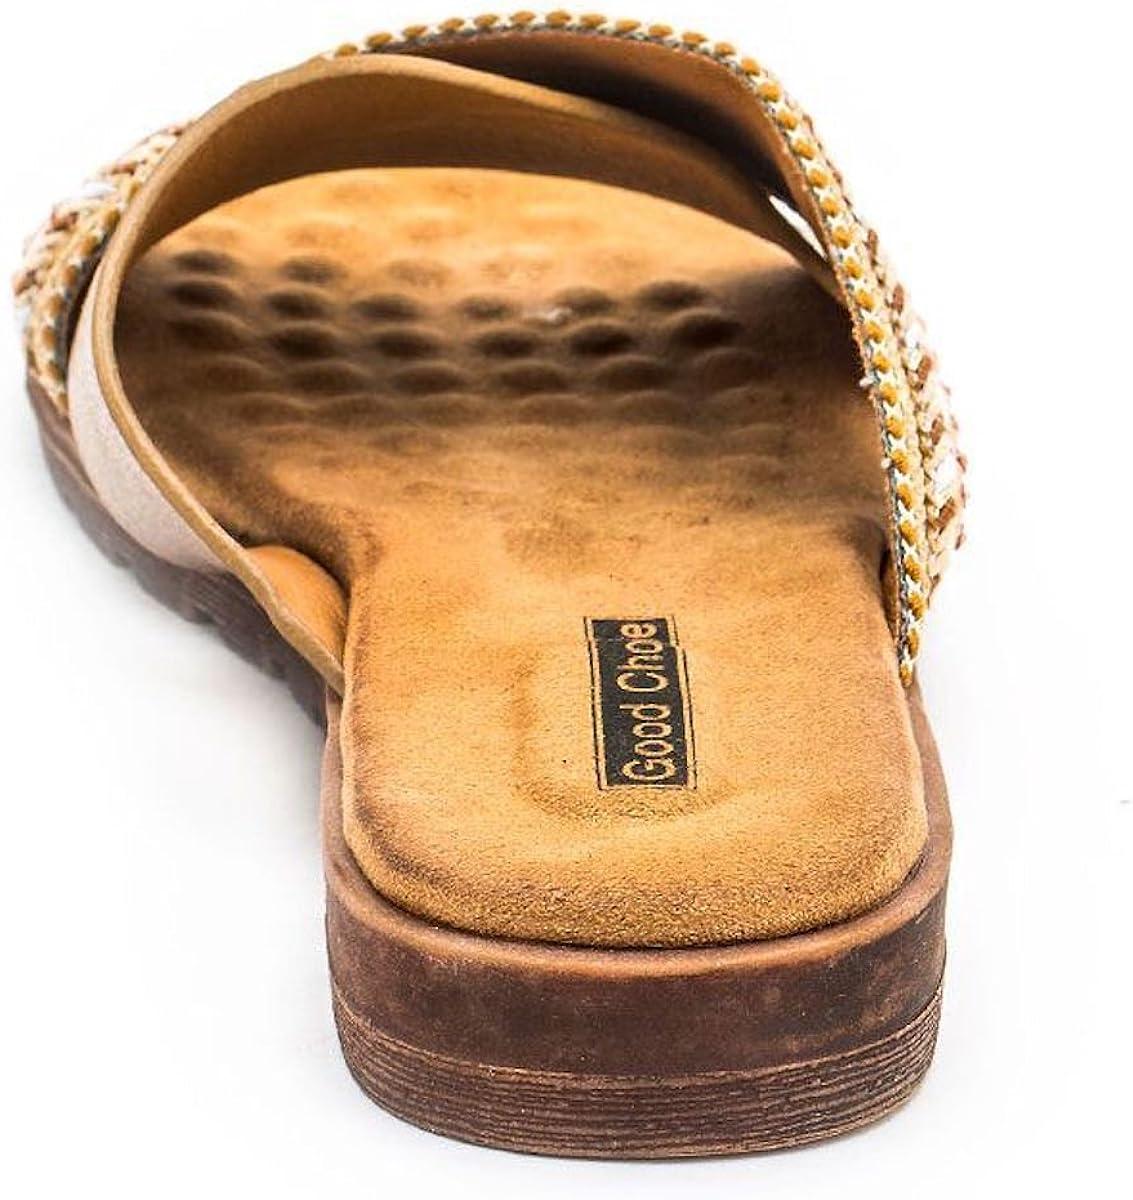 Good Choice Ari Slide Sandals